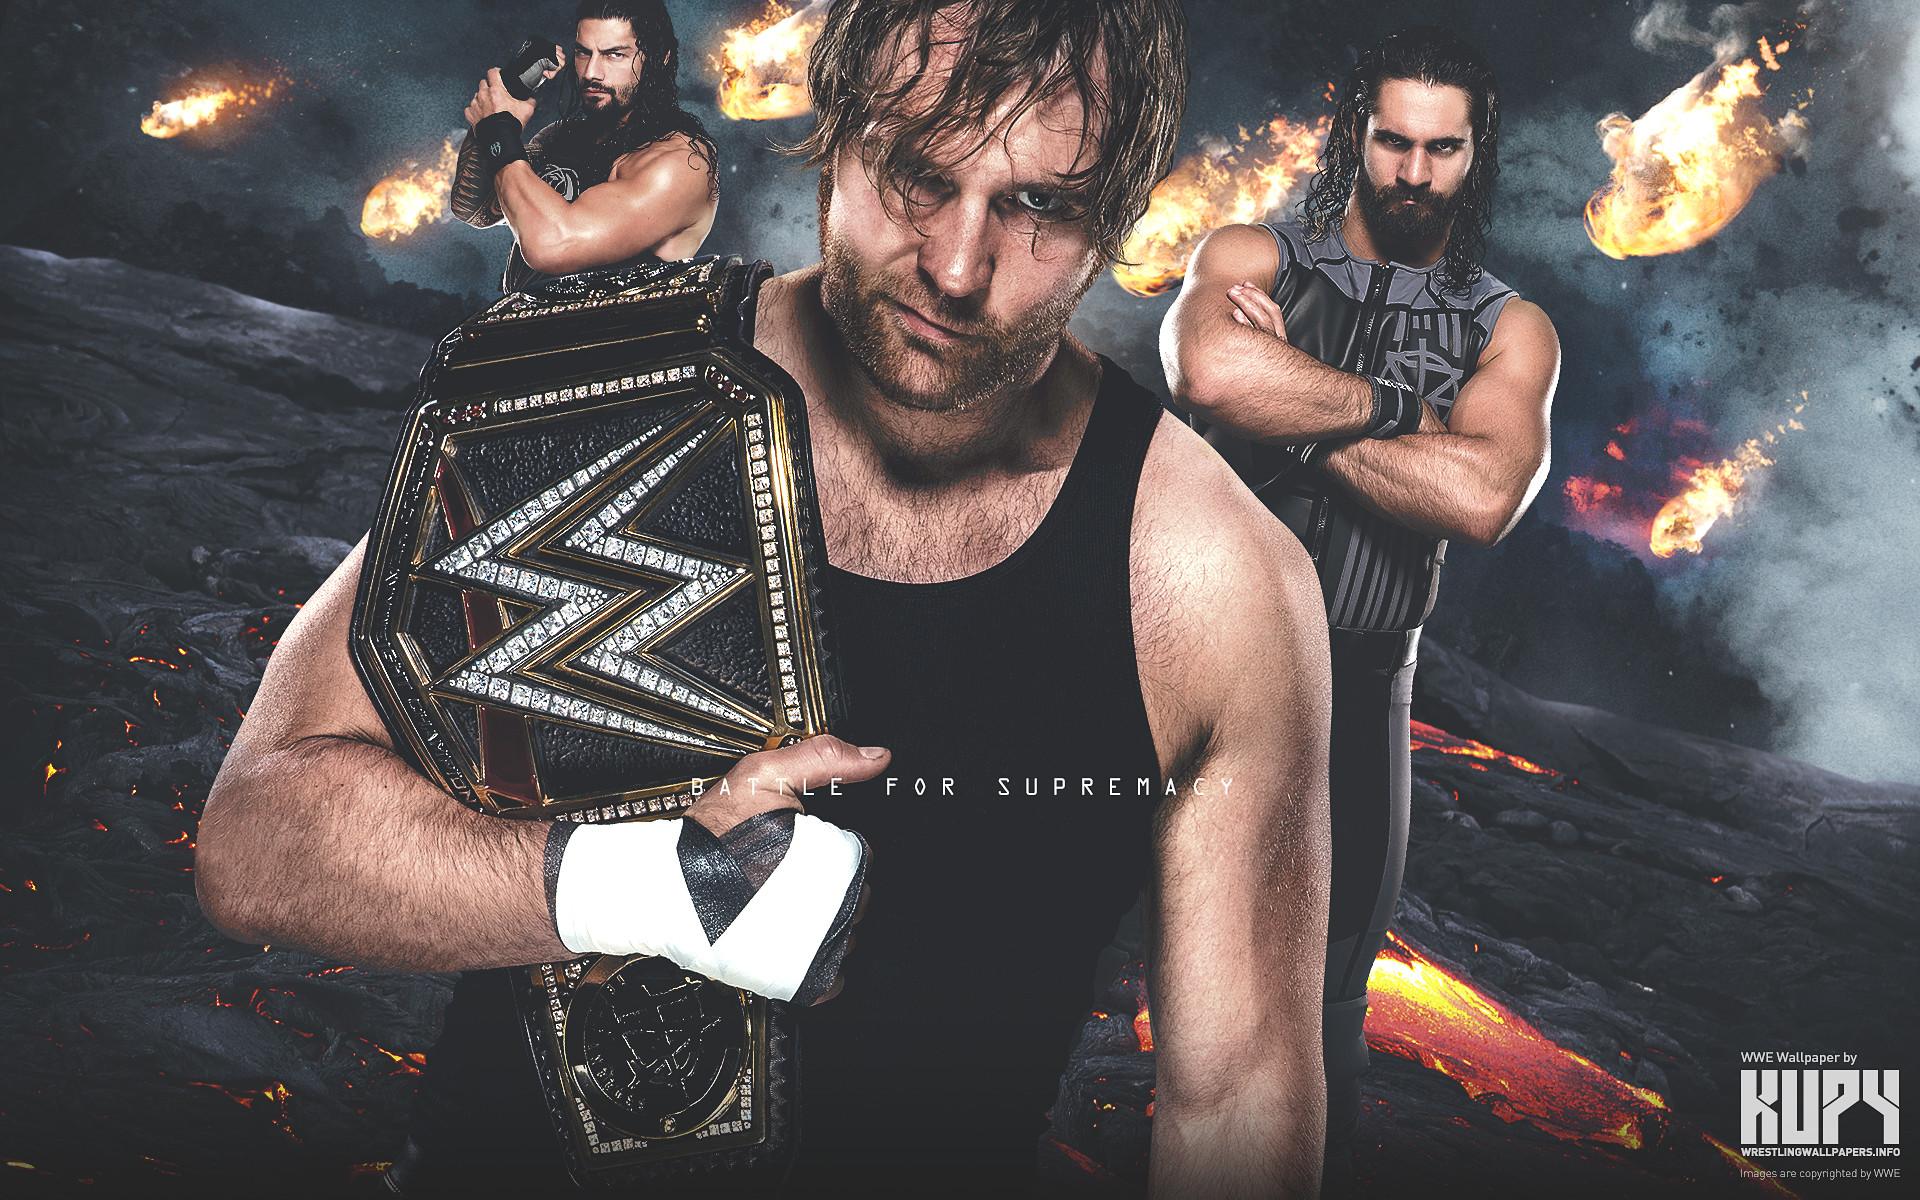 … WWE Championship wallpaper 1920×1200 …